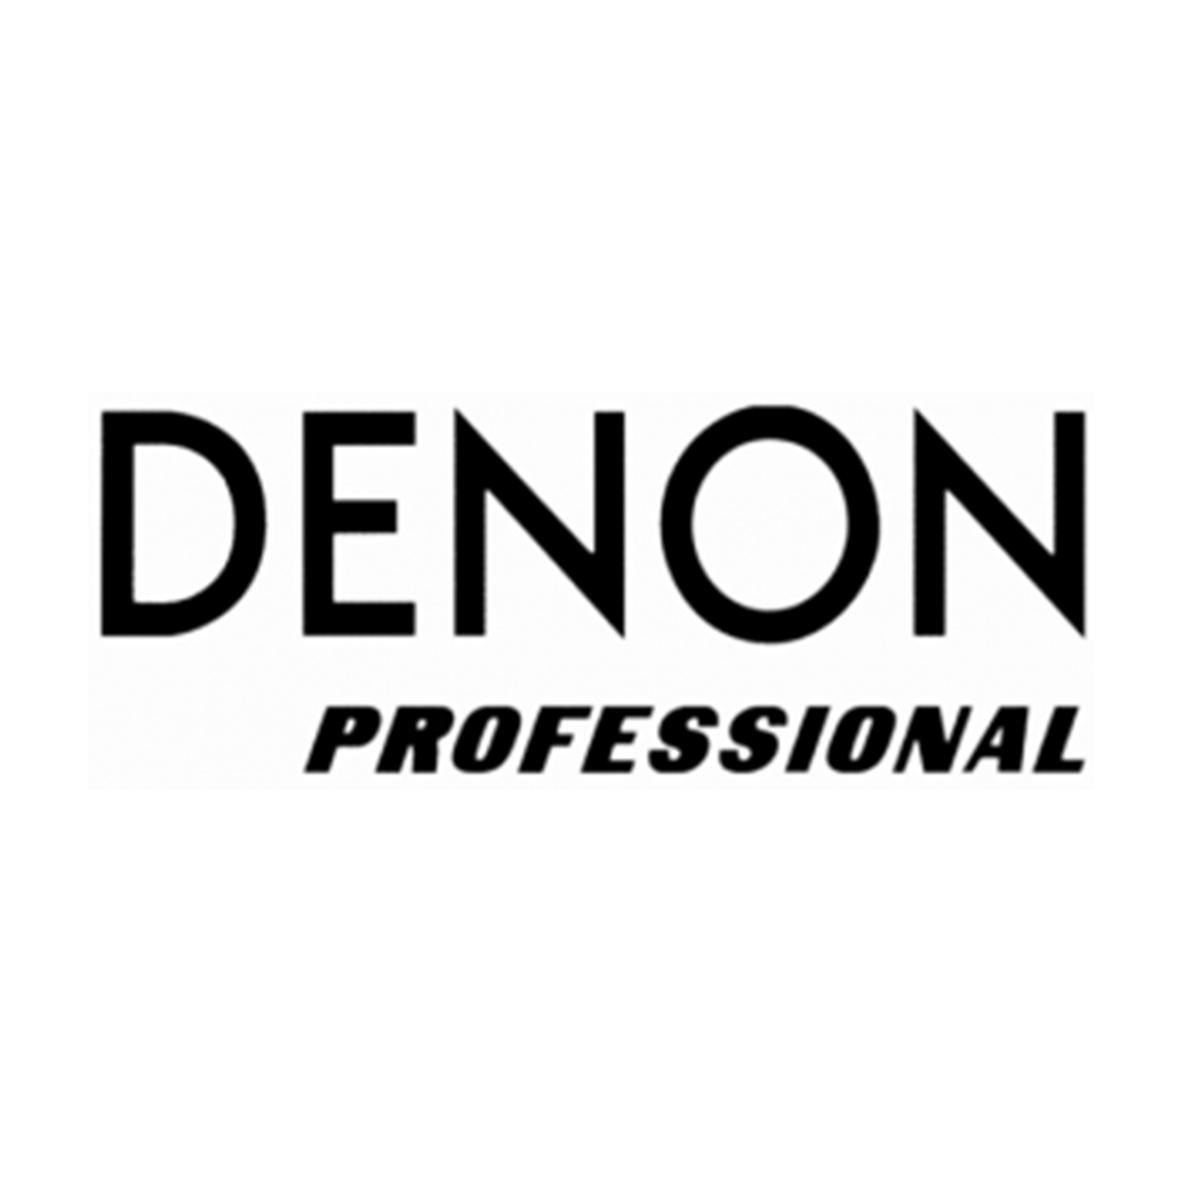 Denon Professional.jpg